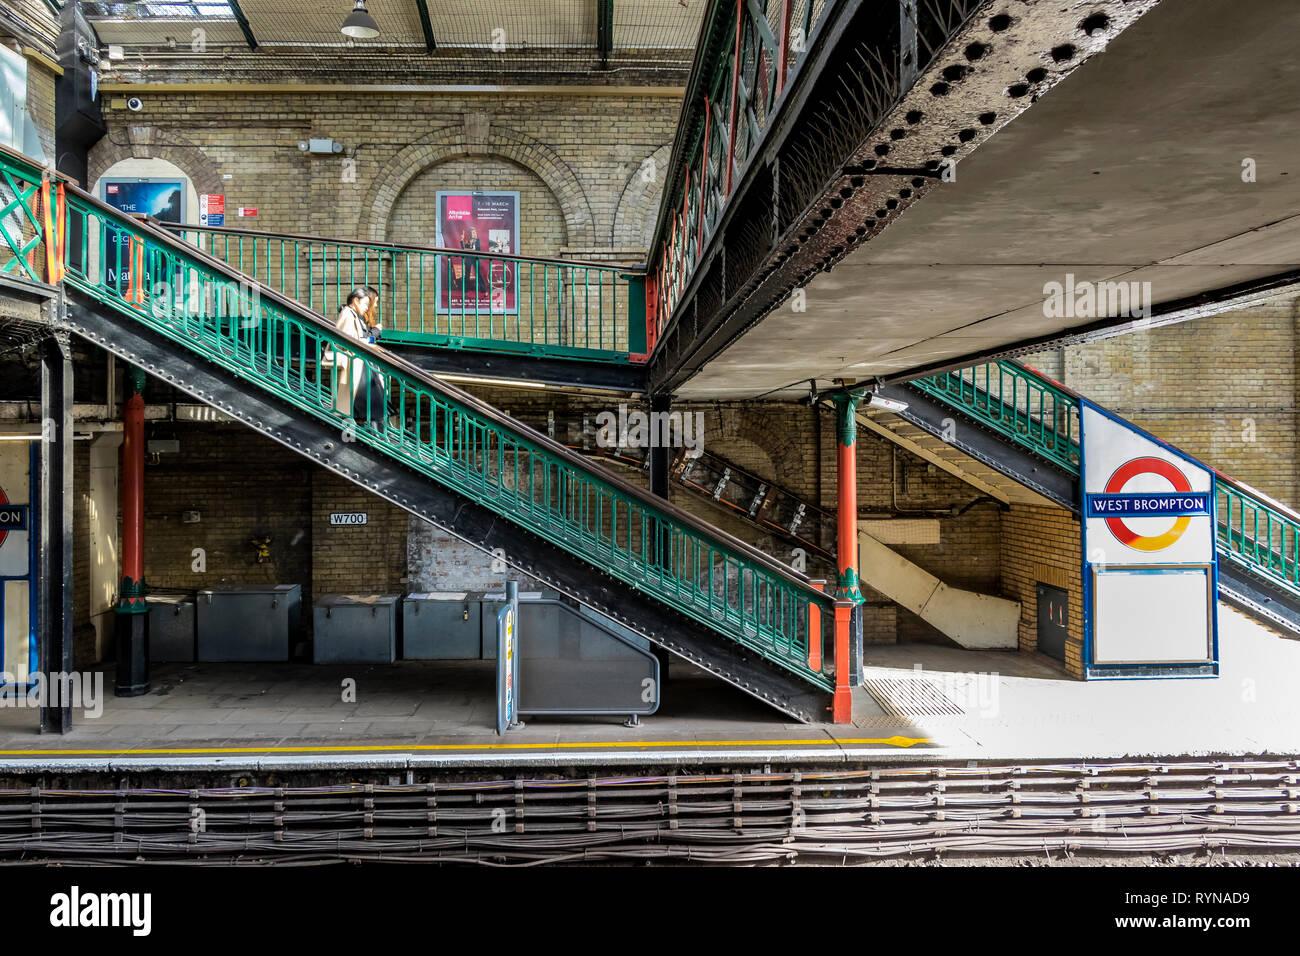 West Brompton Underground Station - Stock Image